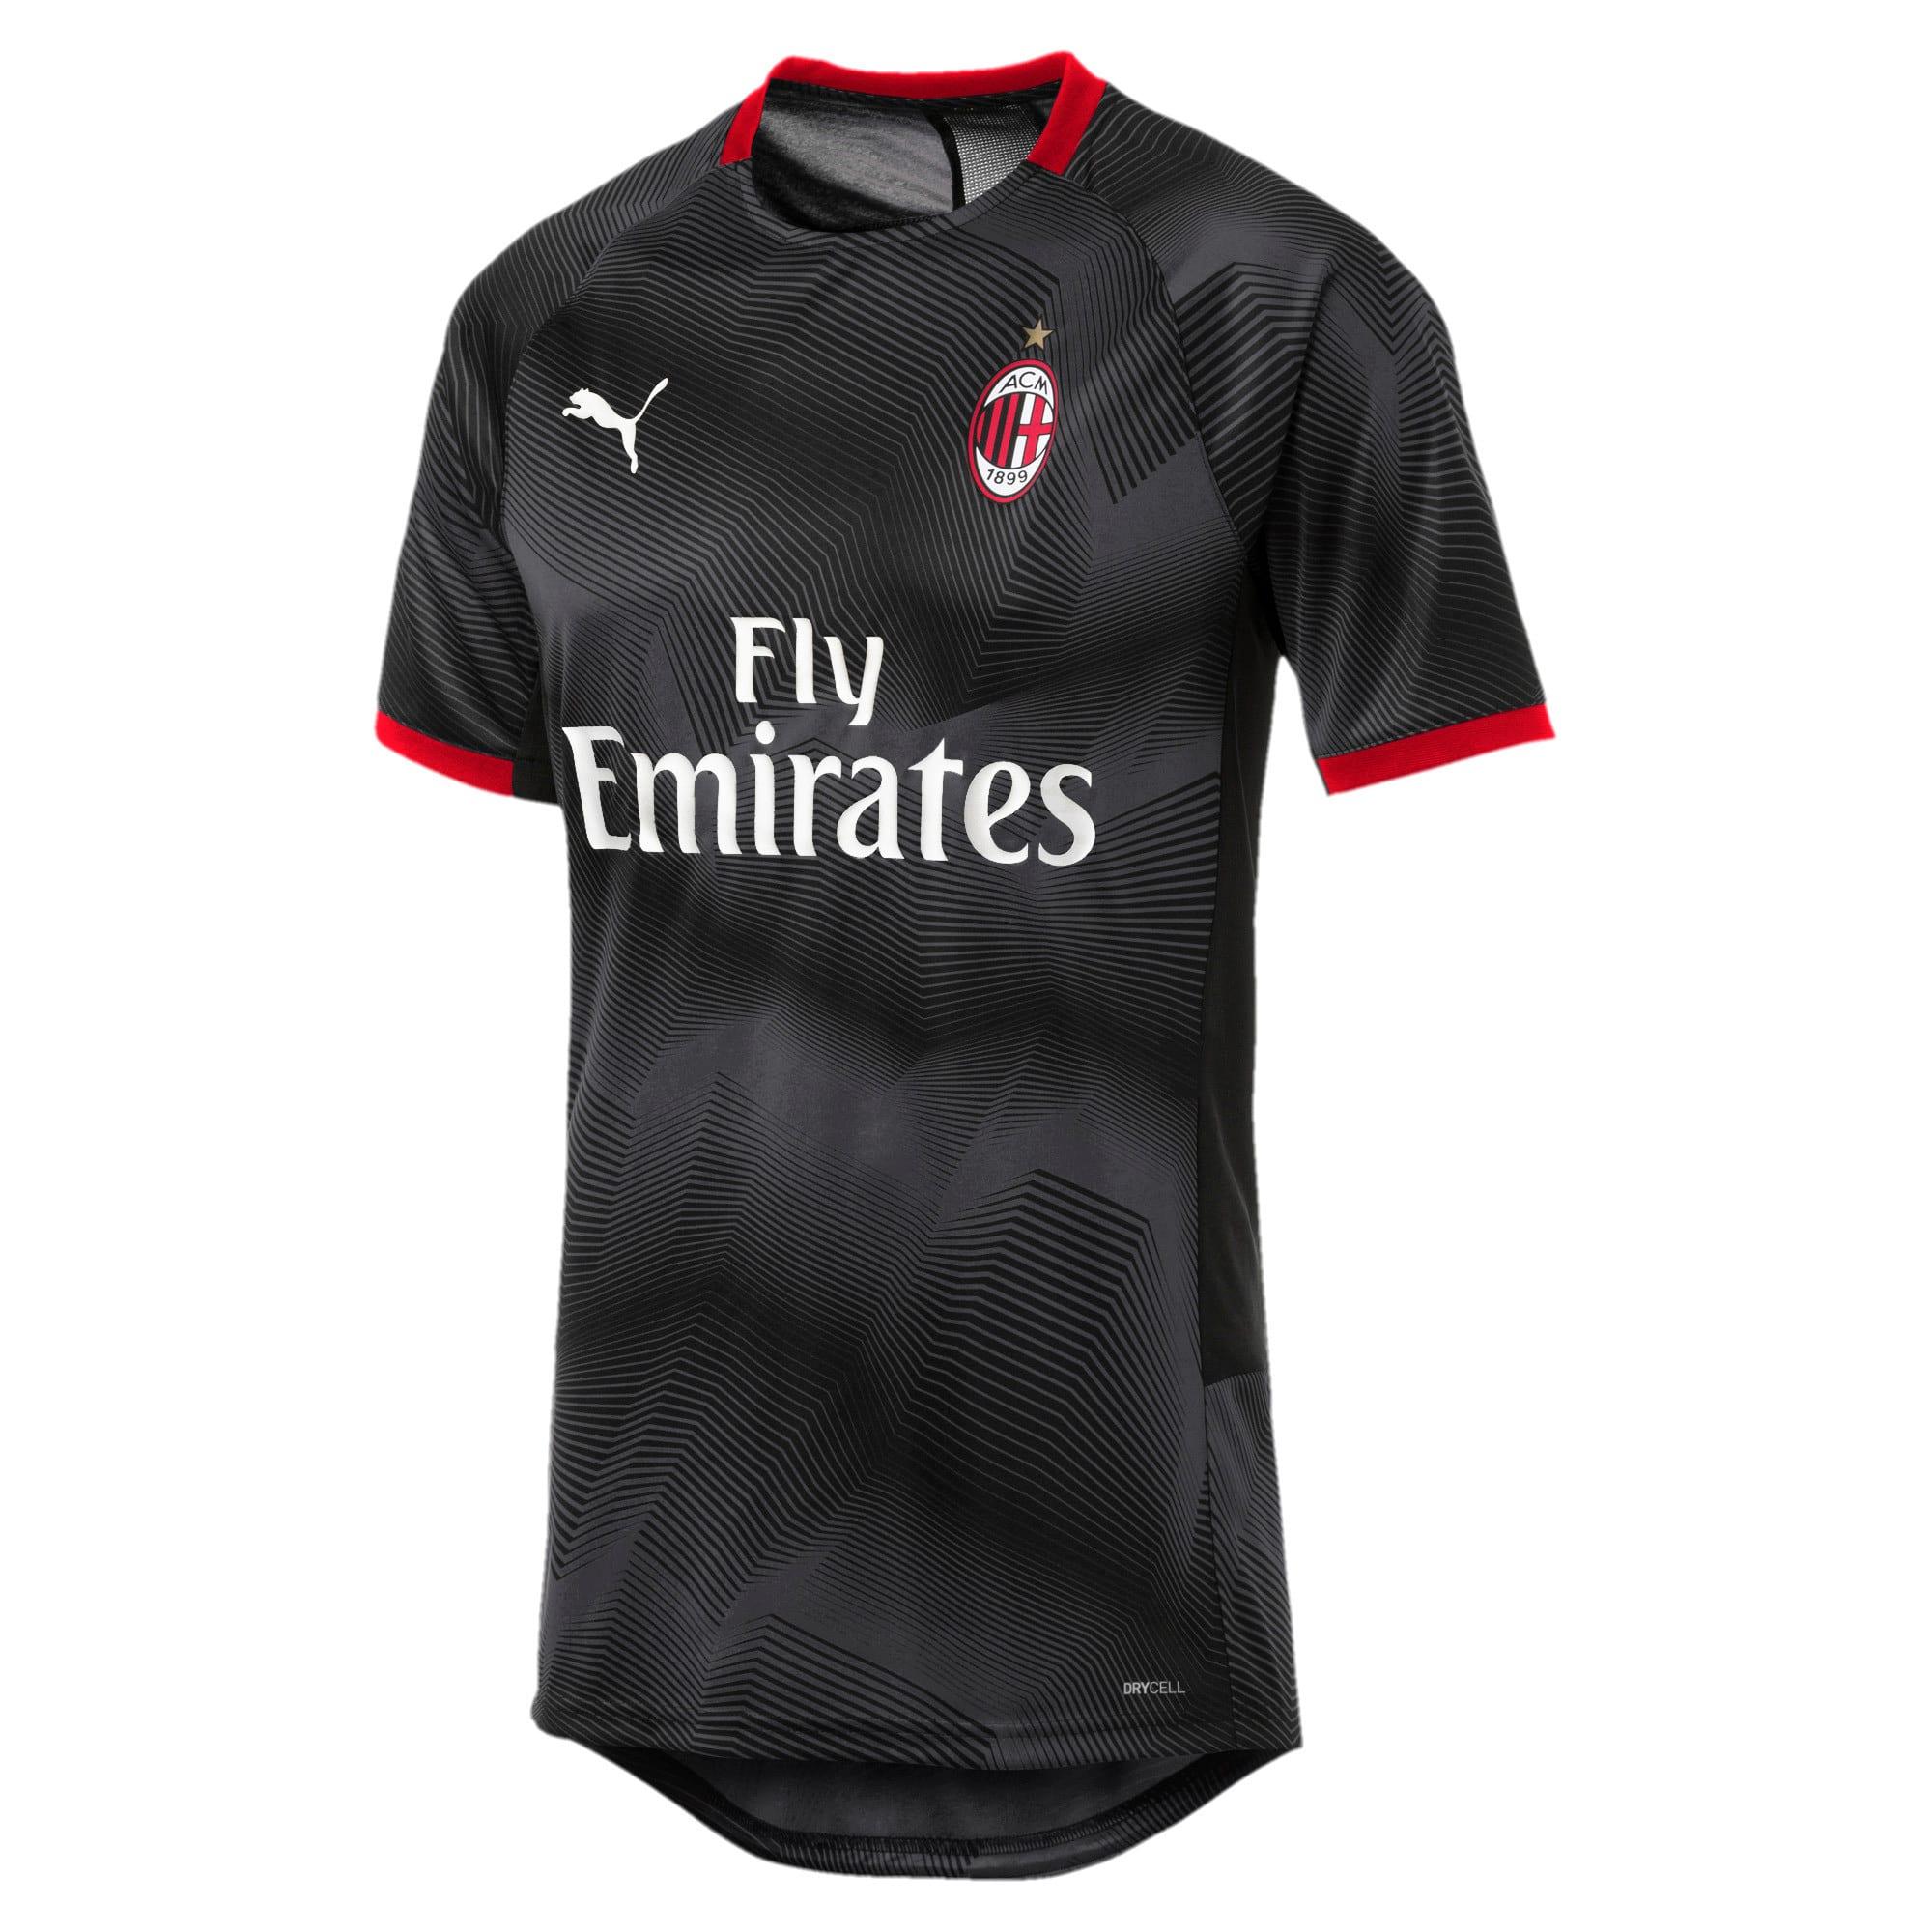 Thumbnail 2 of AC Milan Stadium Jersey, Puma Black-Dark Shadow, medium